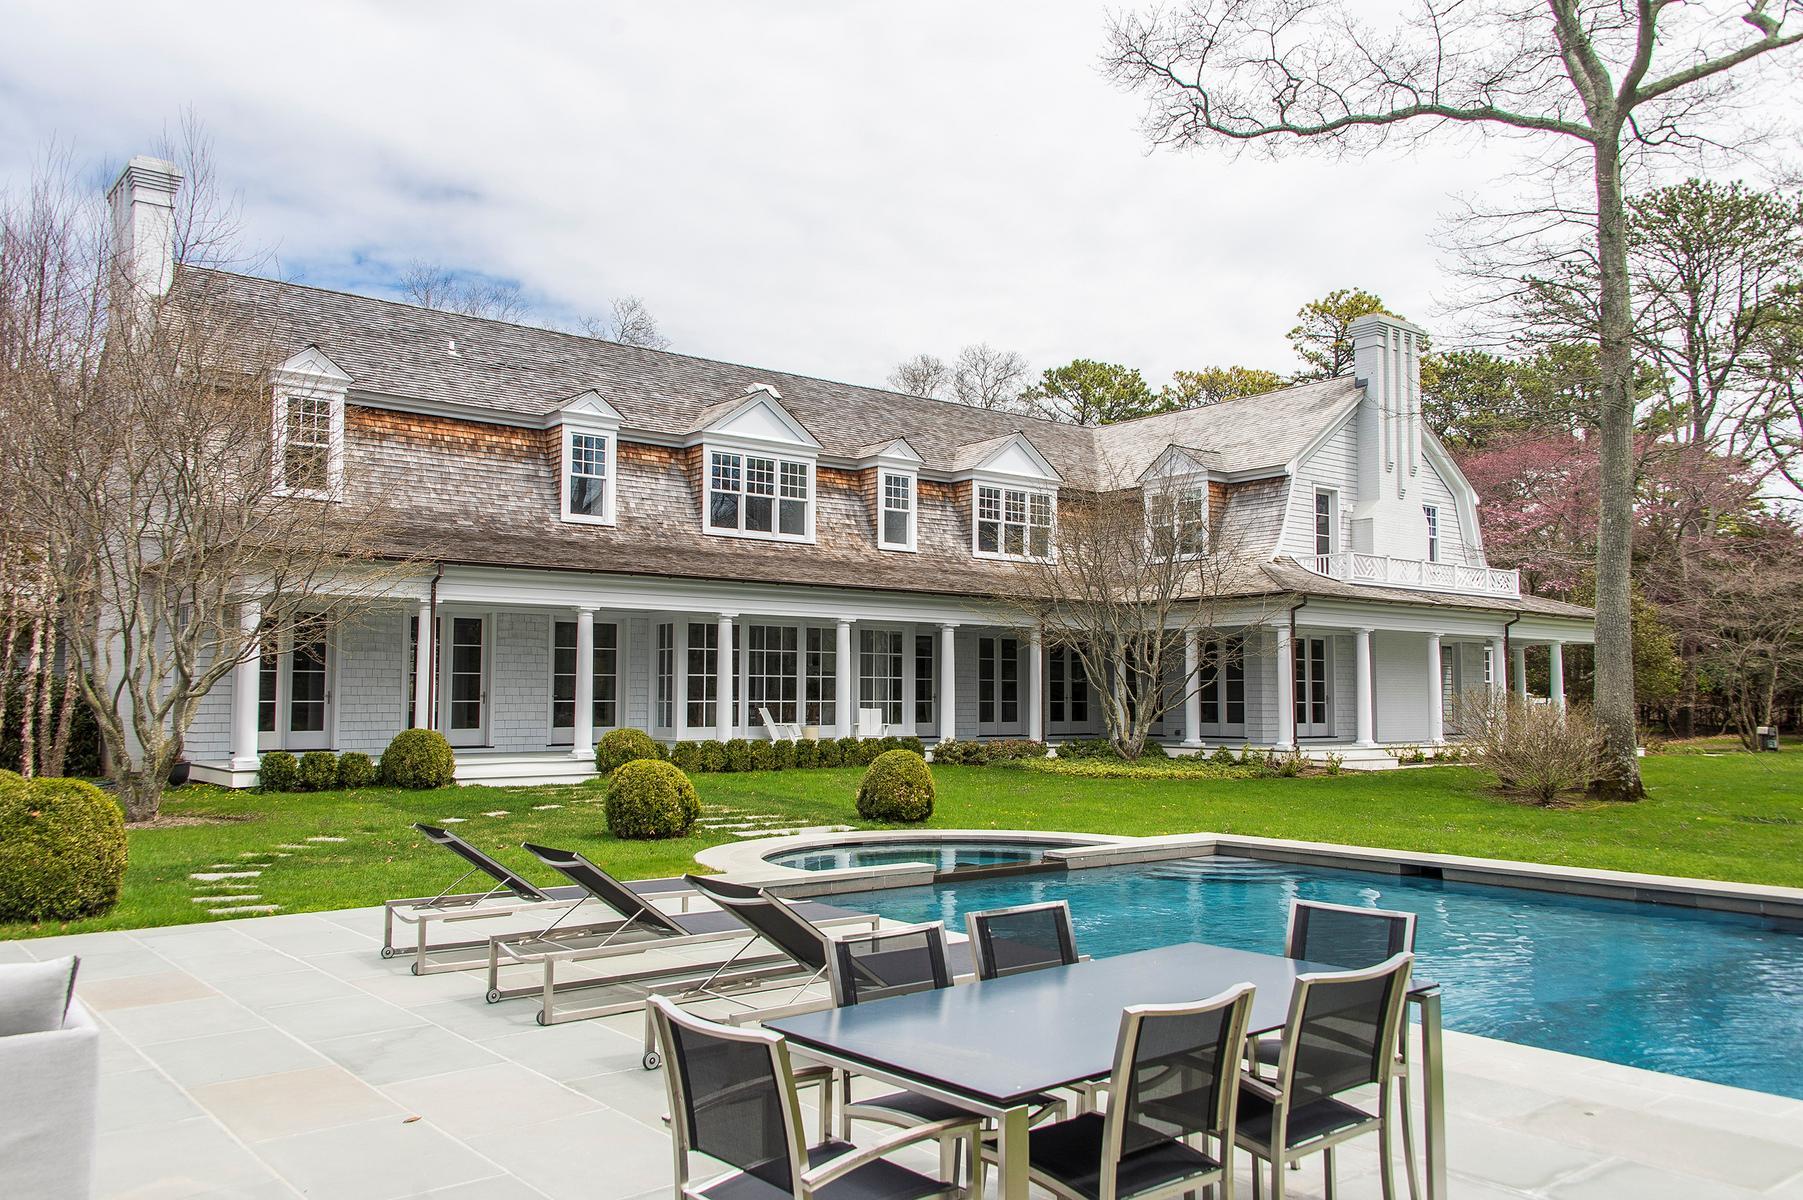 Single Family for Sale at East Hampton 11 Jones Cove Road East Hampton, New York 11937 United States